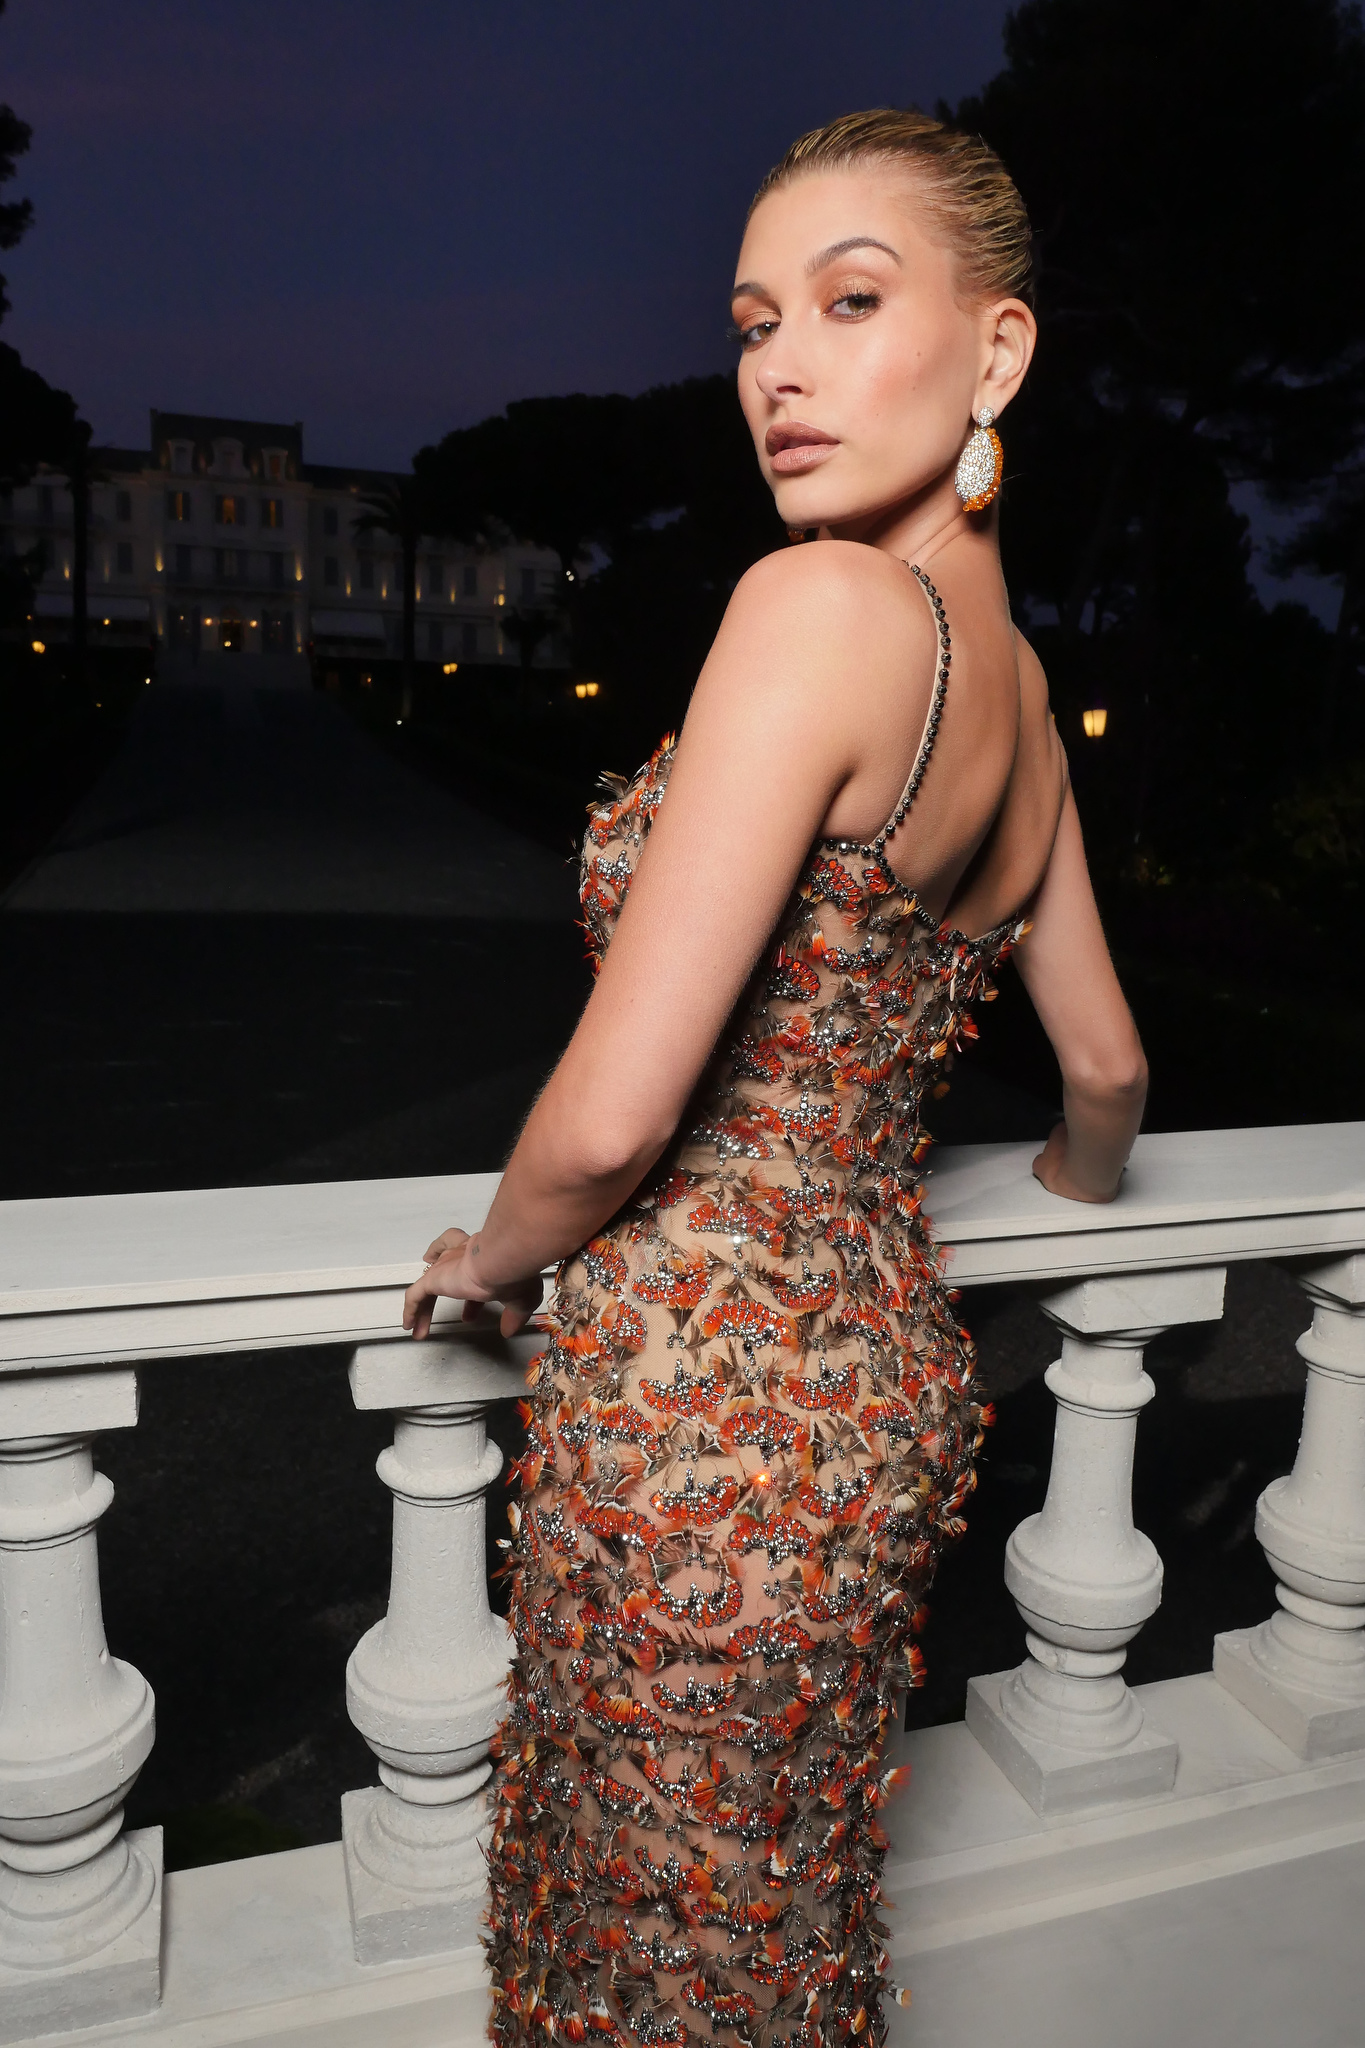 Exclusive photos inside the De Grisogono Party in Cannes: Hailey Baldwin